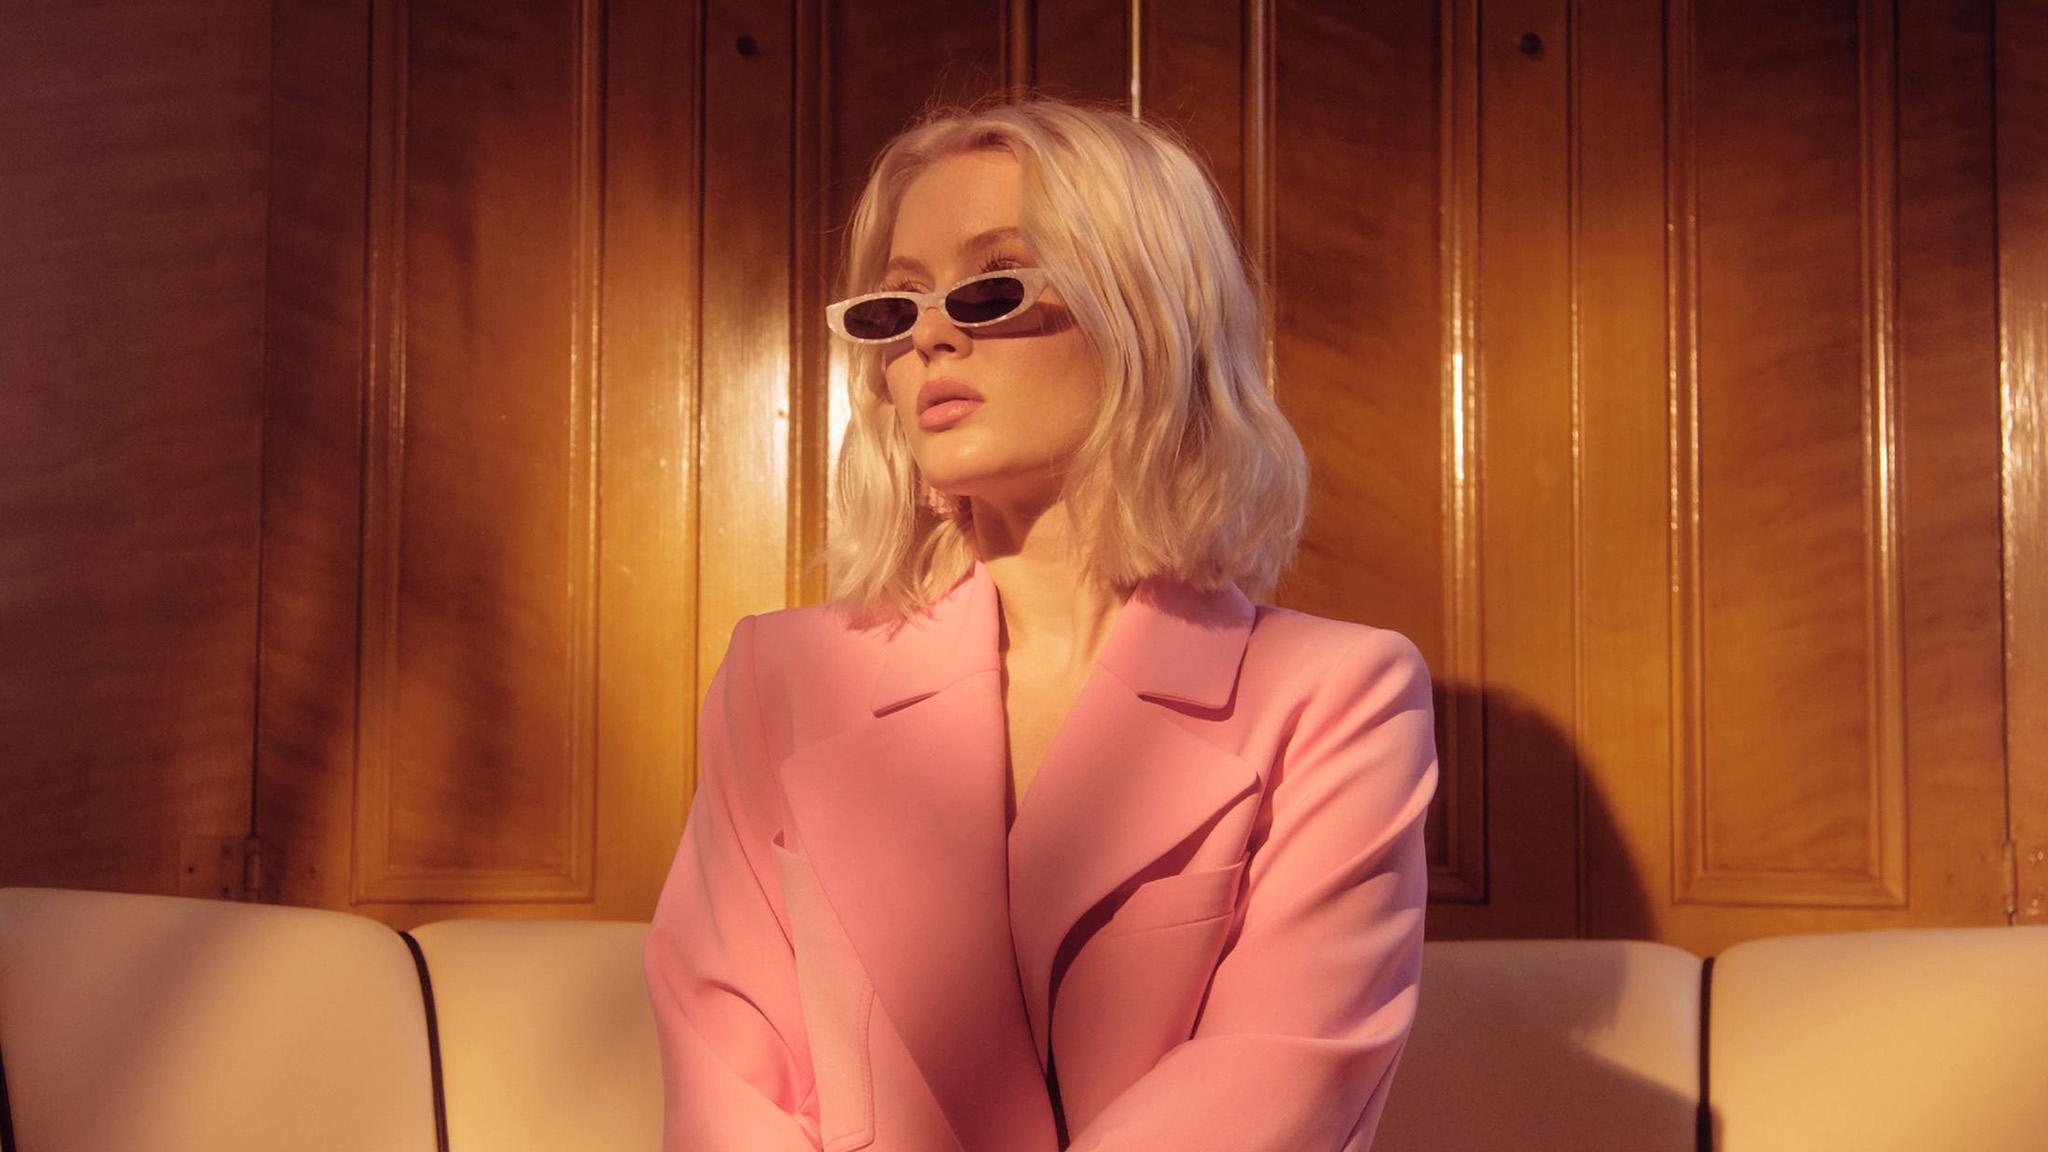 d6d40e70 Zara Larsson: 'Pop could be a positive force' | Financial Times